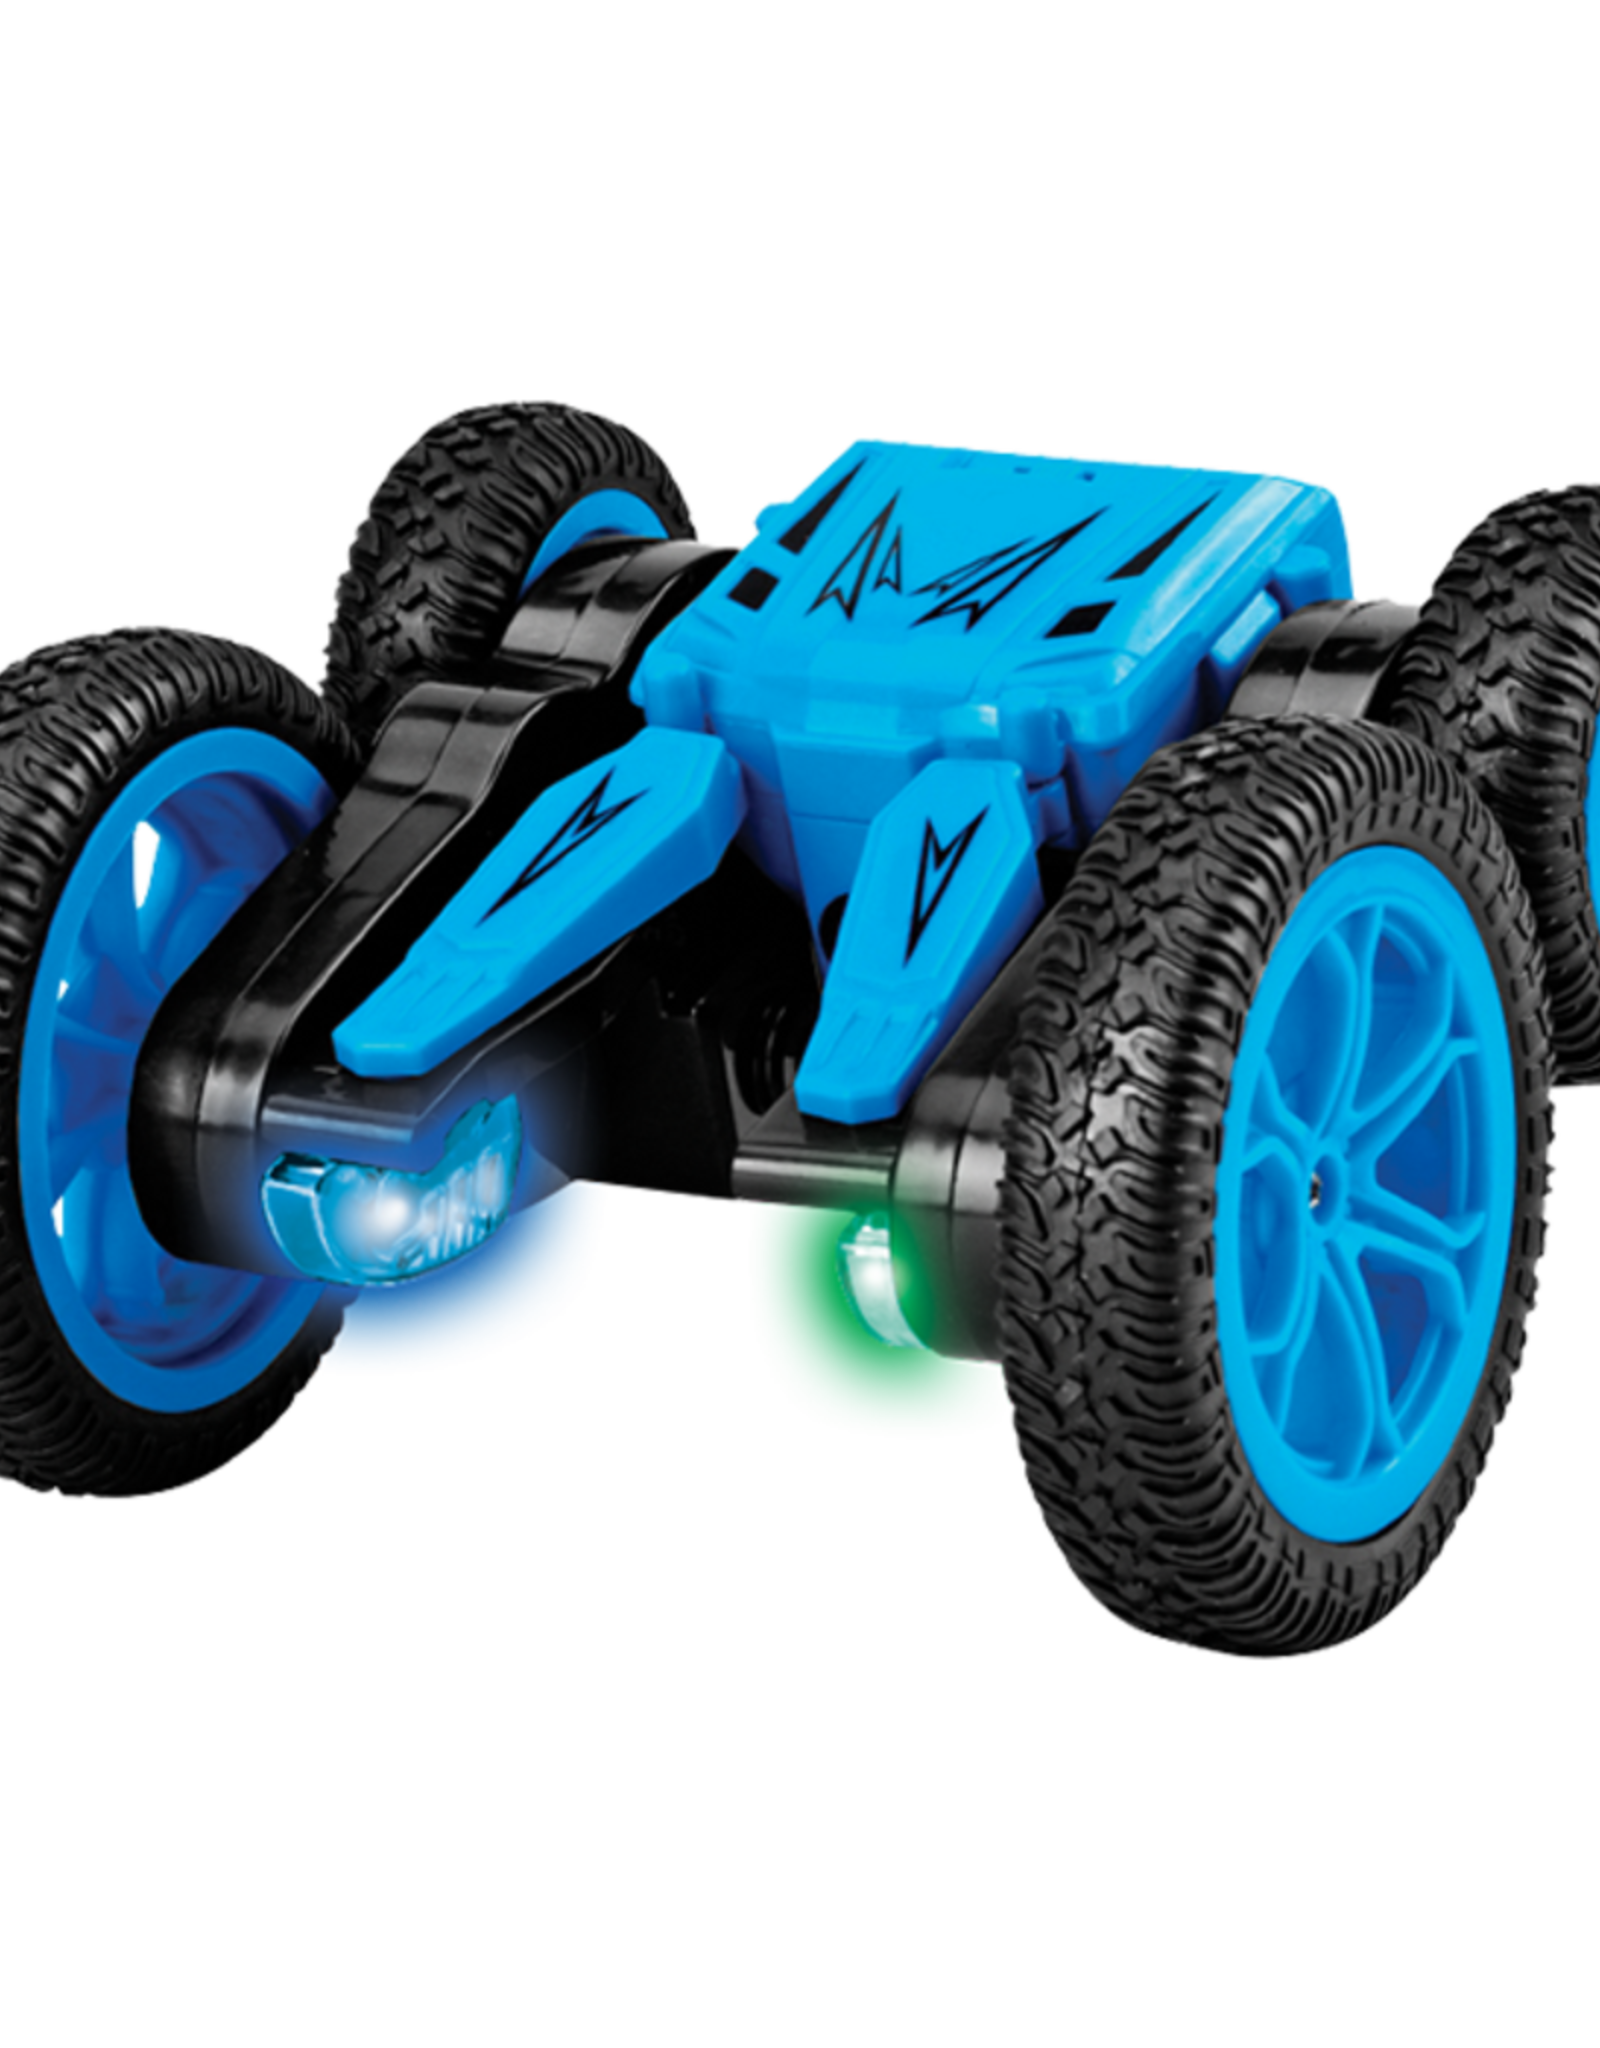 Split Wheel Stunt Car